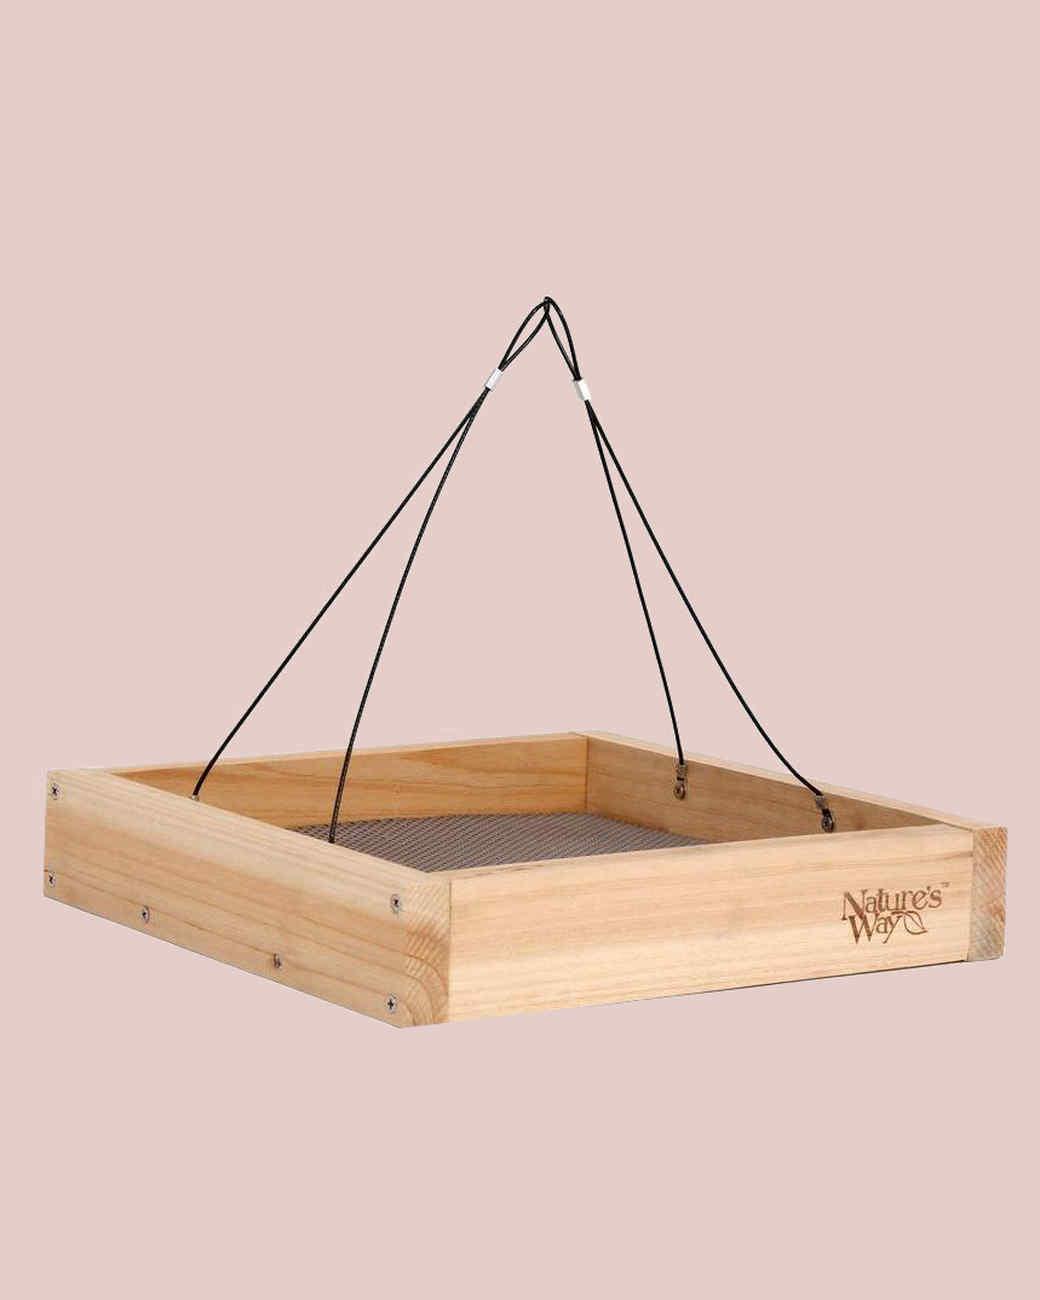 natures way tray bird feeder